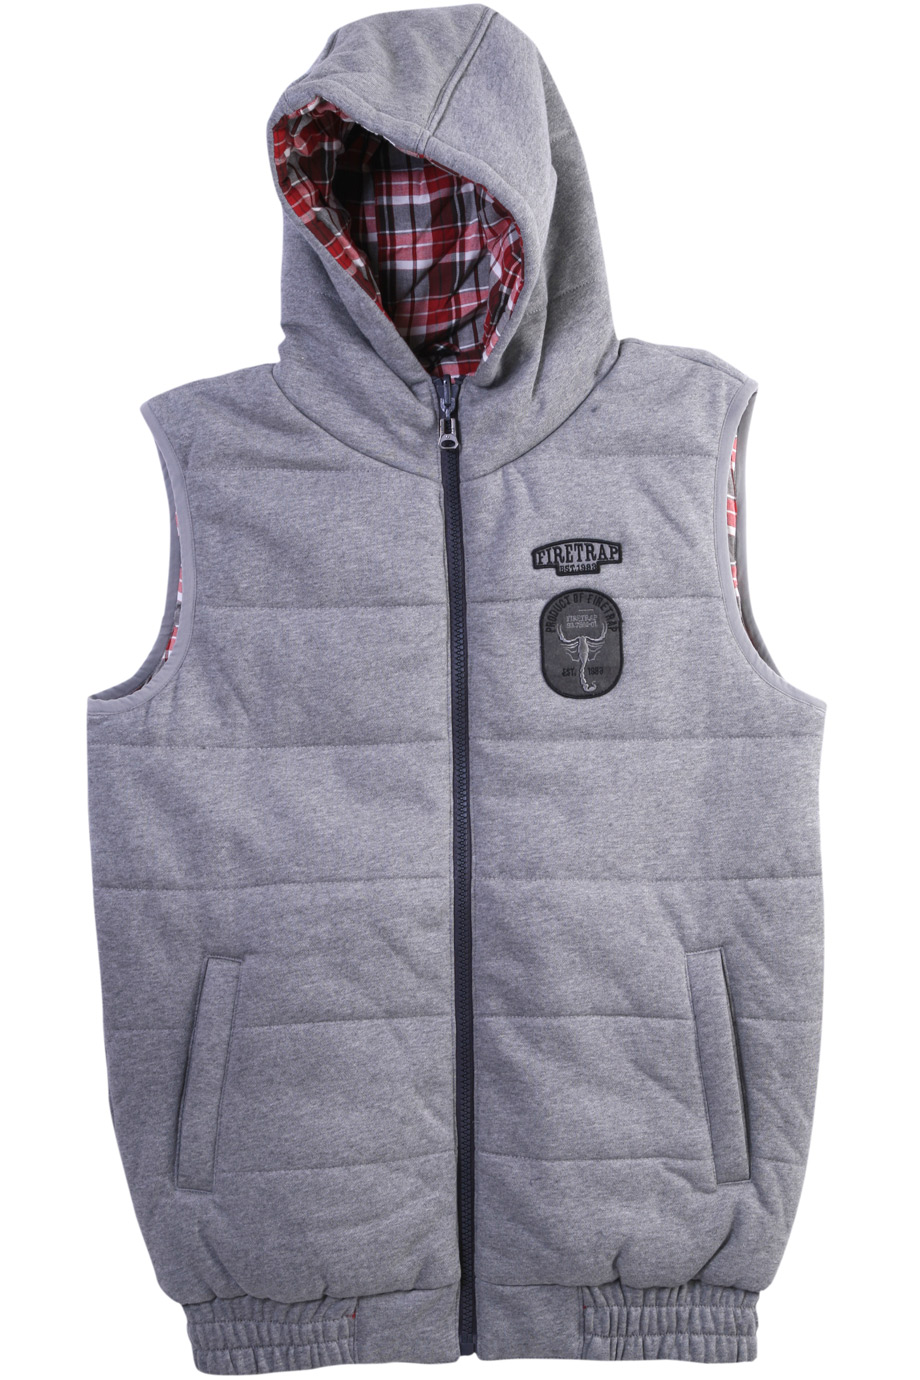 Firetrap ανδρικά ρούχα σε προσφορά  33c92f63f71